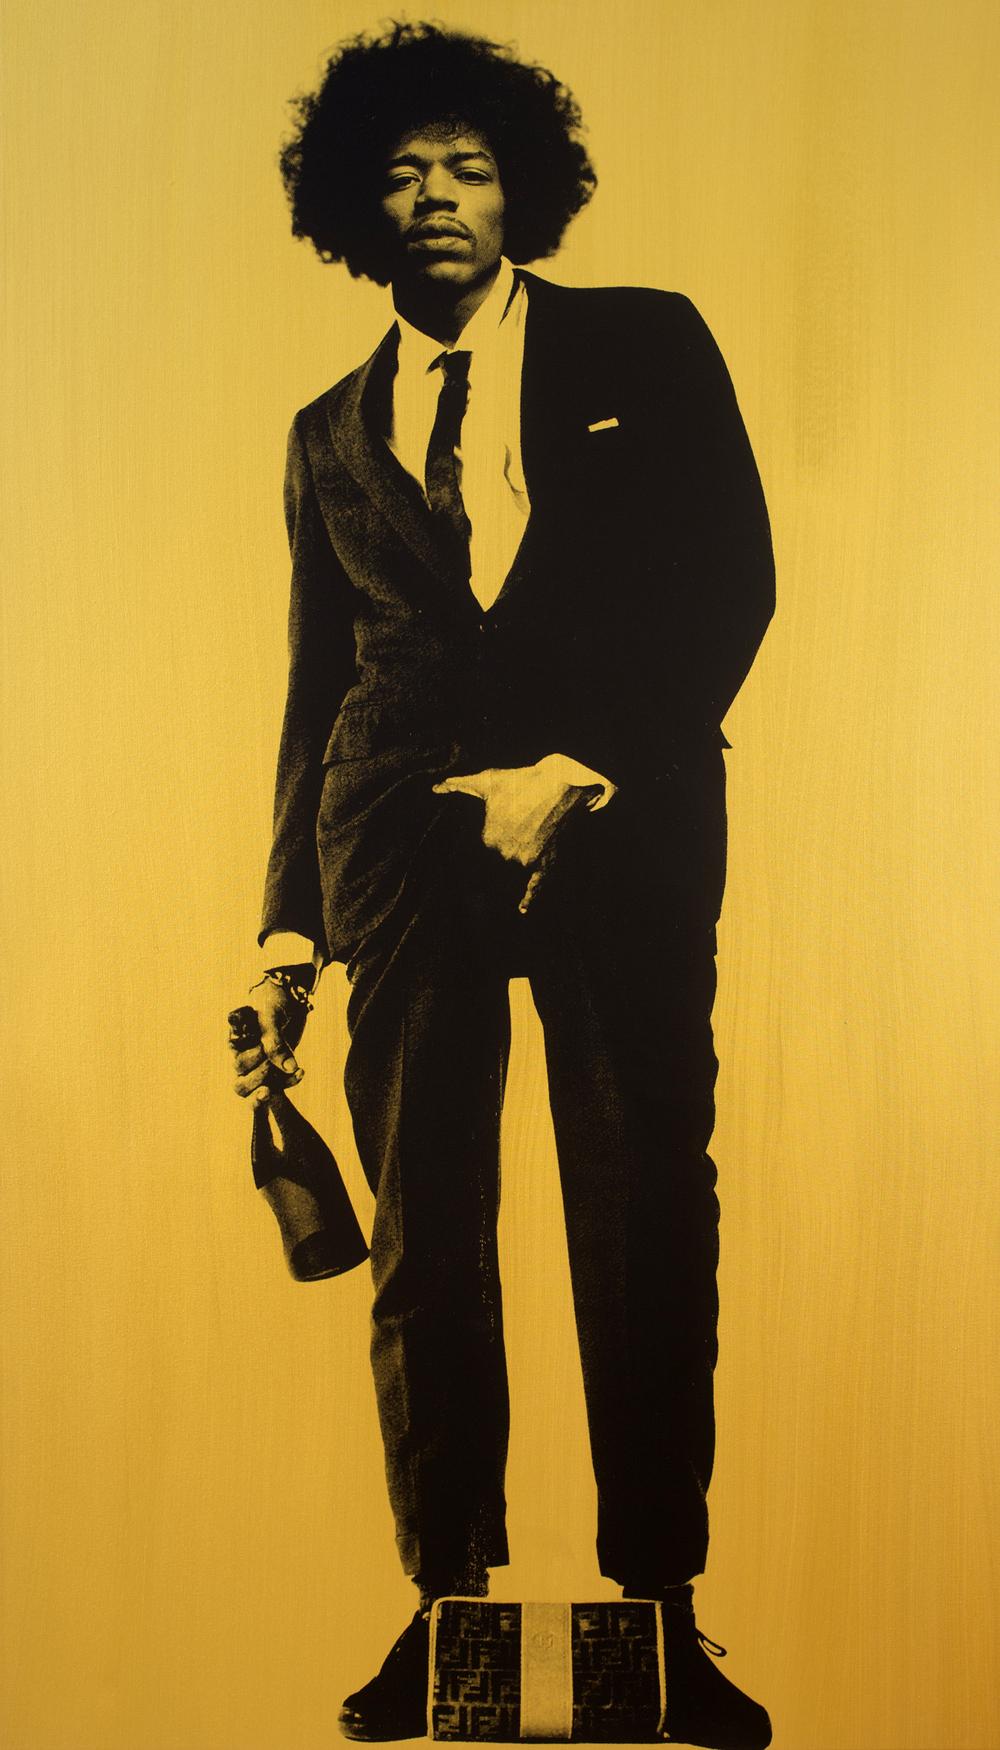 "Jimi Hendrix (Gold)_84"" x 48""_Silkscreen and Acrylic on Canvas_$15,000.00_2015.jpg"